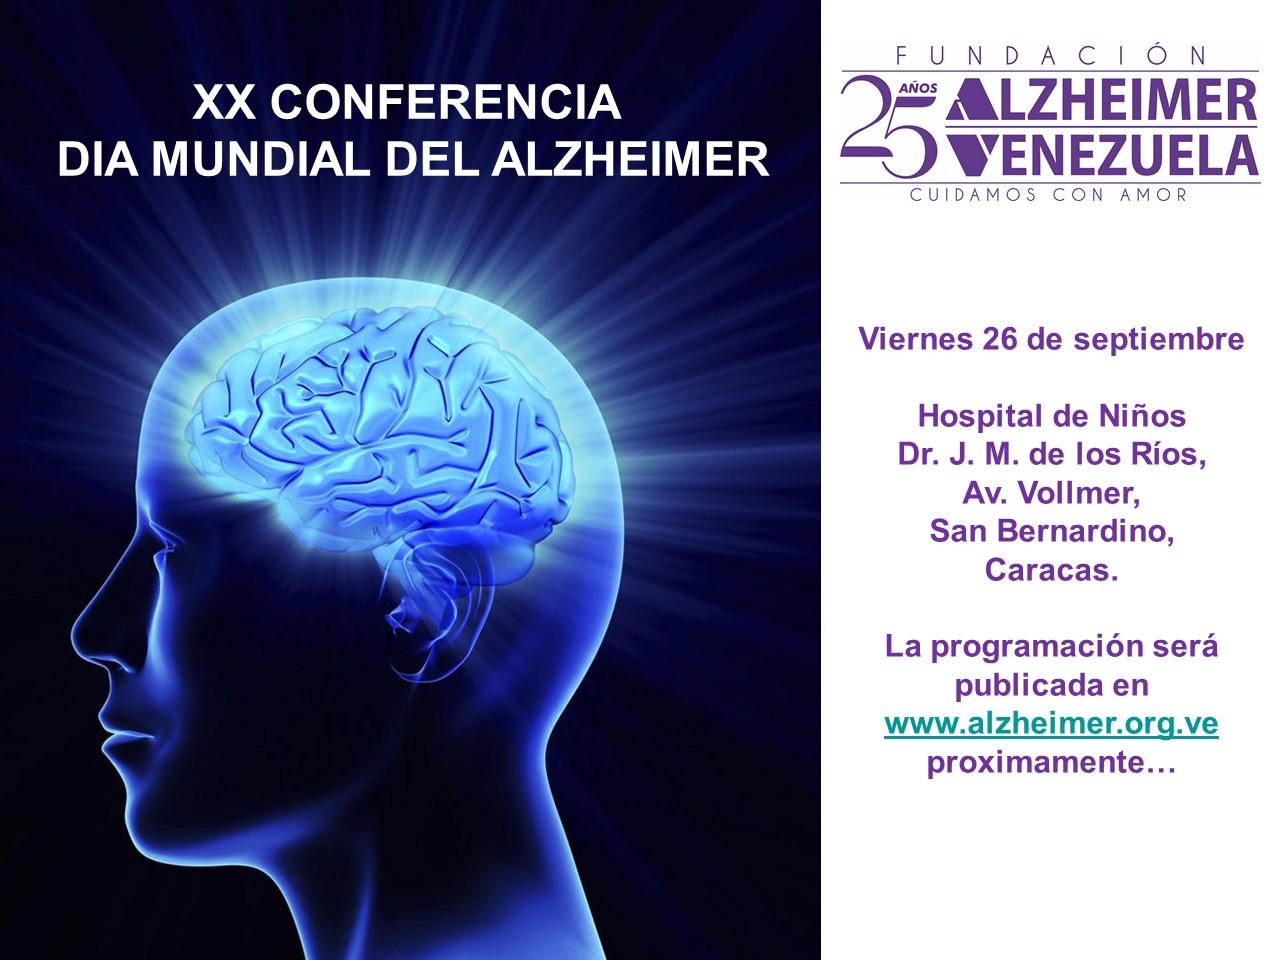 XX Conferencia Dia Mundial del Alzheimer